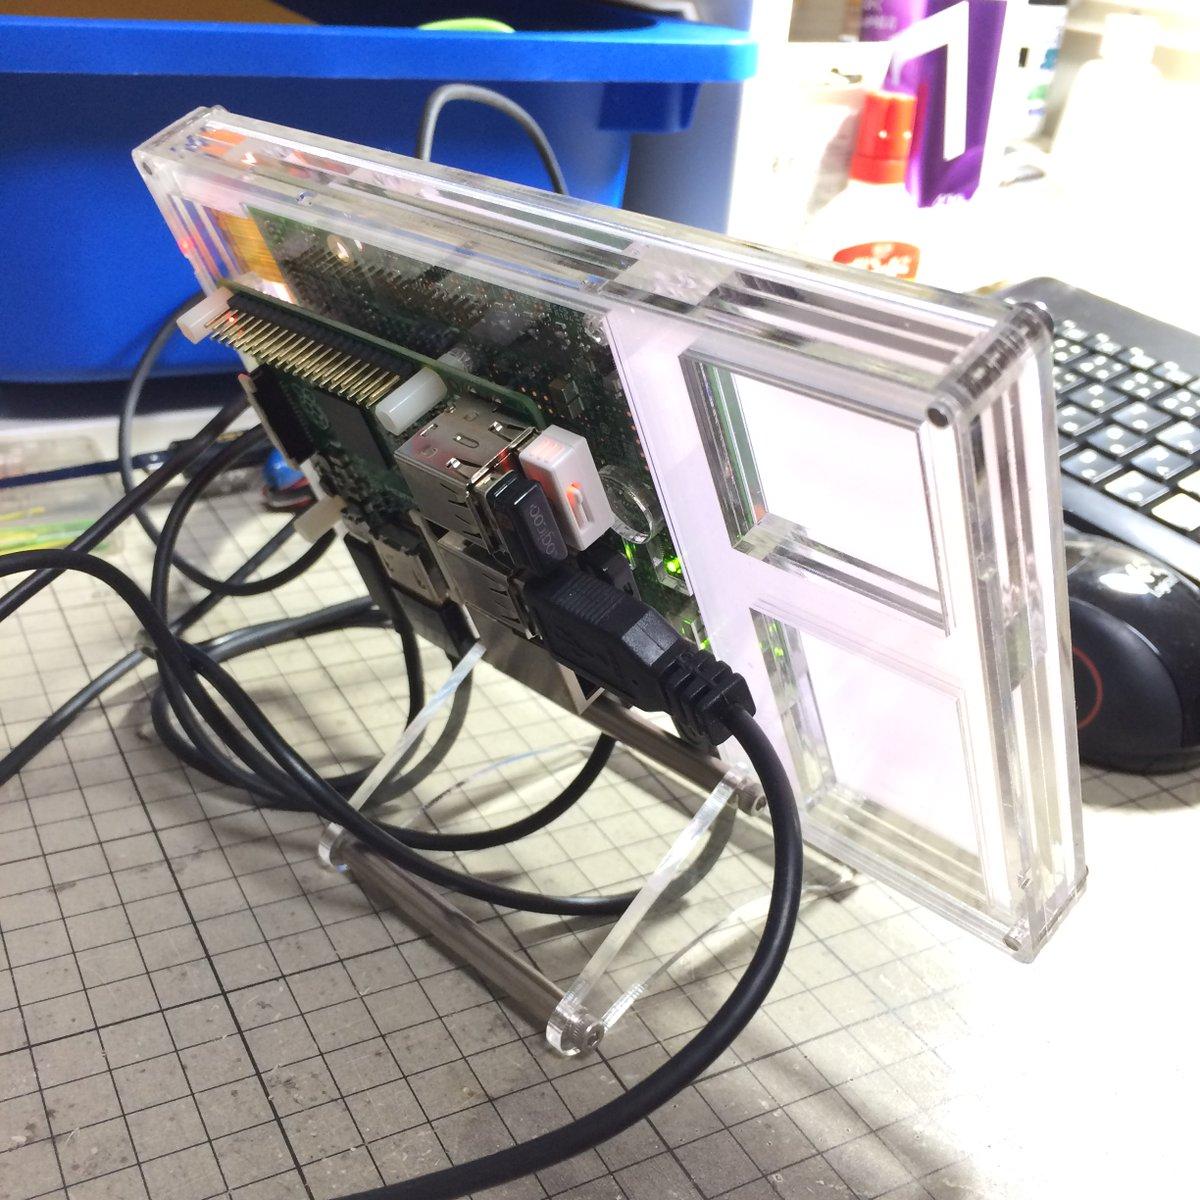 Raspberry Piも背面に取り付けられるようにしました。 https://t.co/SOokzdNqi5